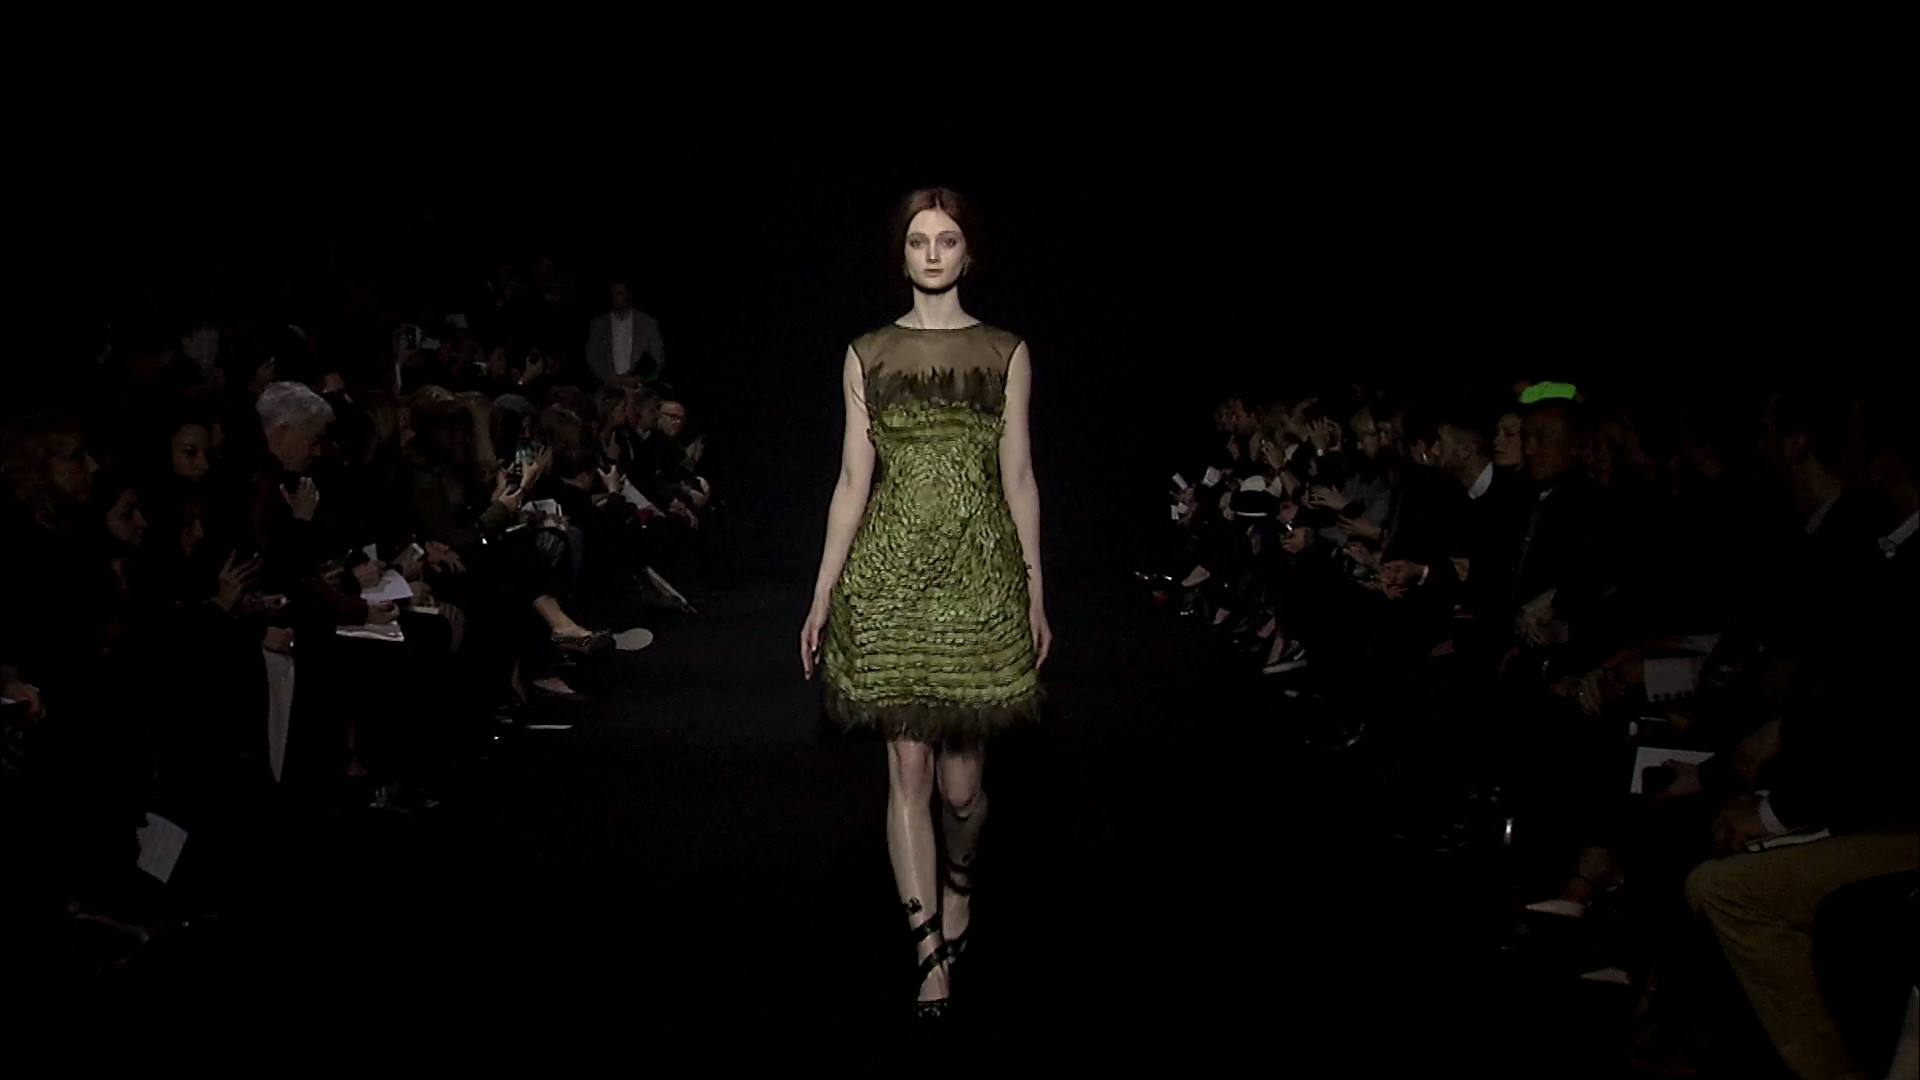 Alberta Ferretti Fall Winter 2014-15 Women's Fashion Show - Milano Fashion Week